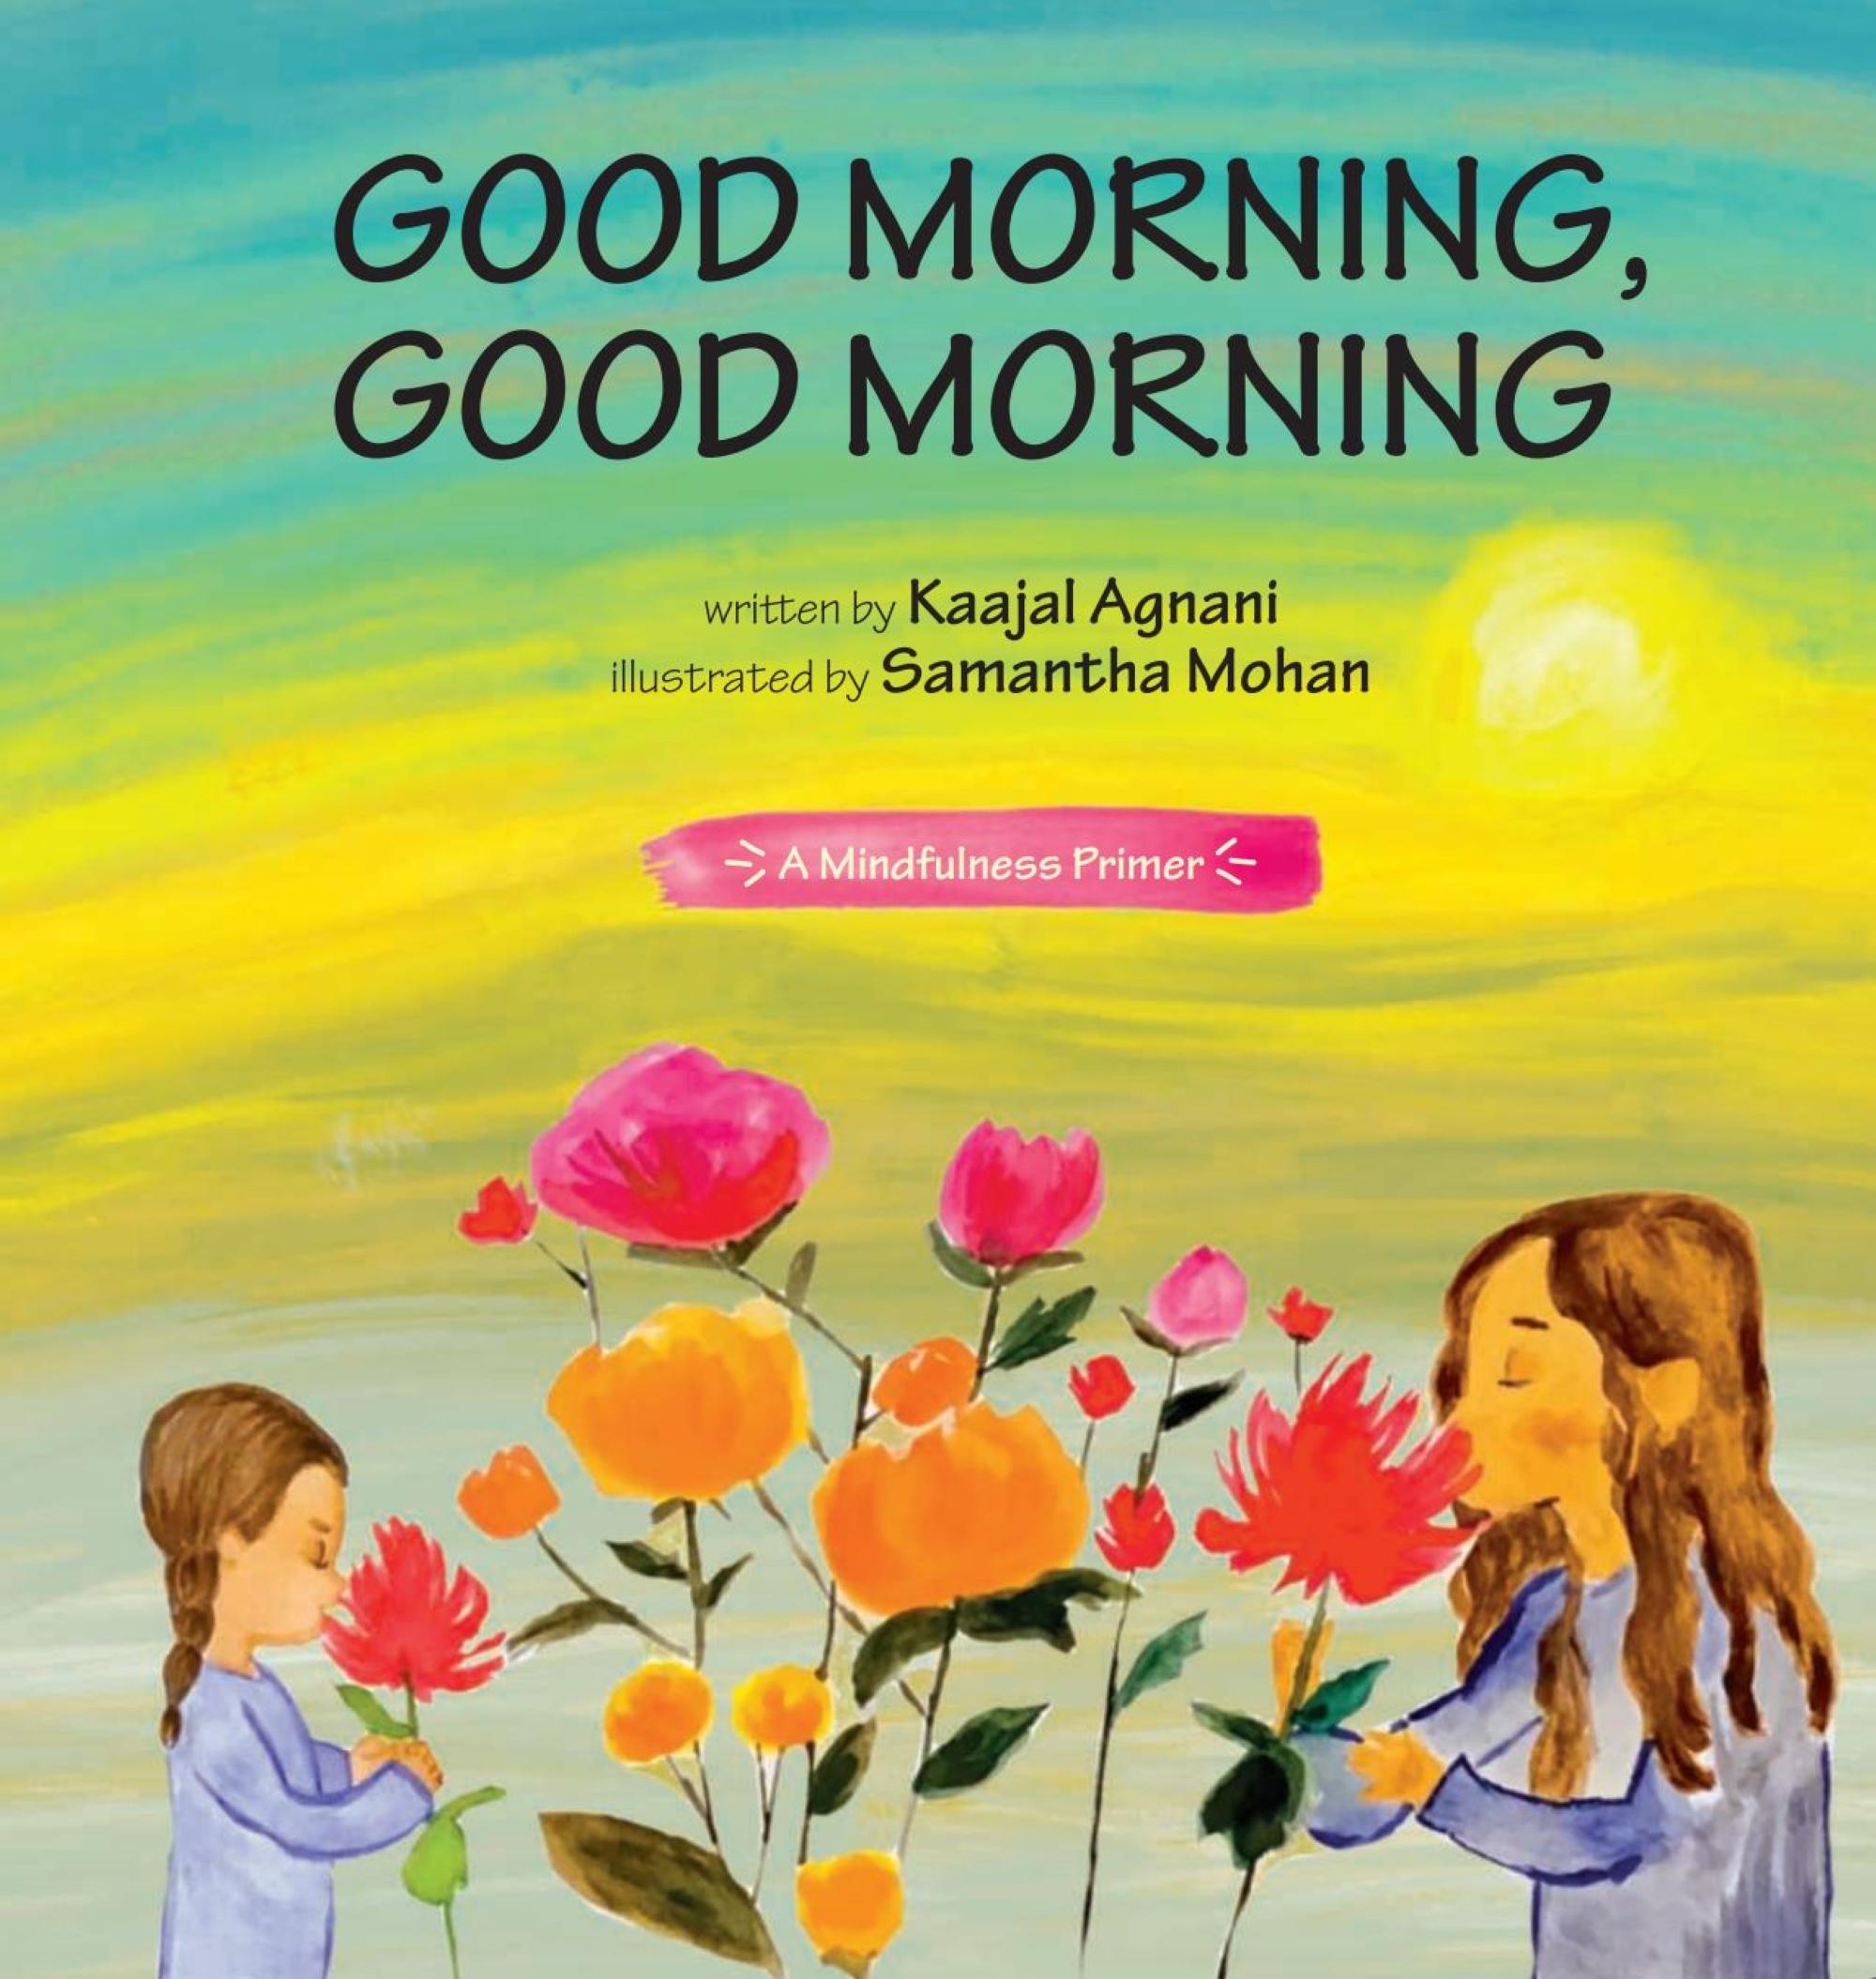 Good Morning, Good Morning by Kaajal Agnani